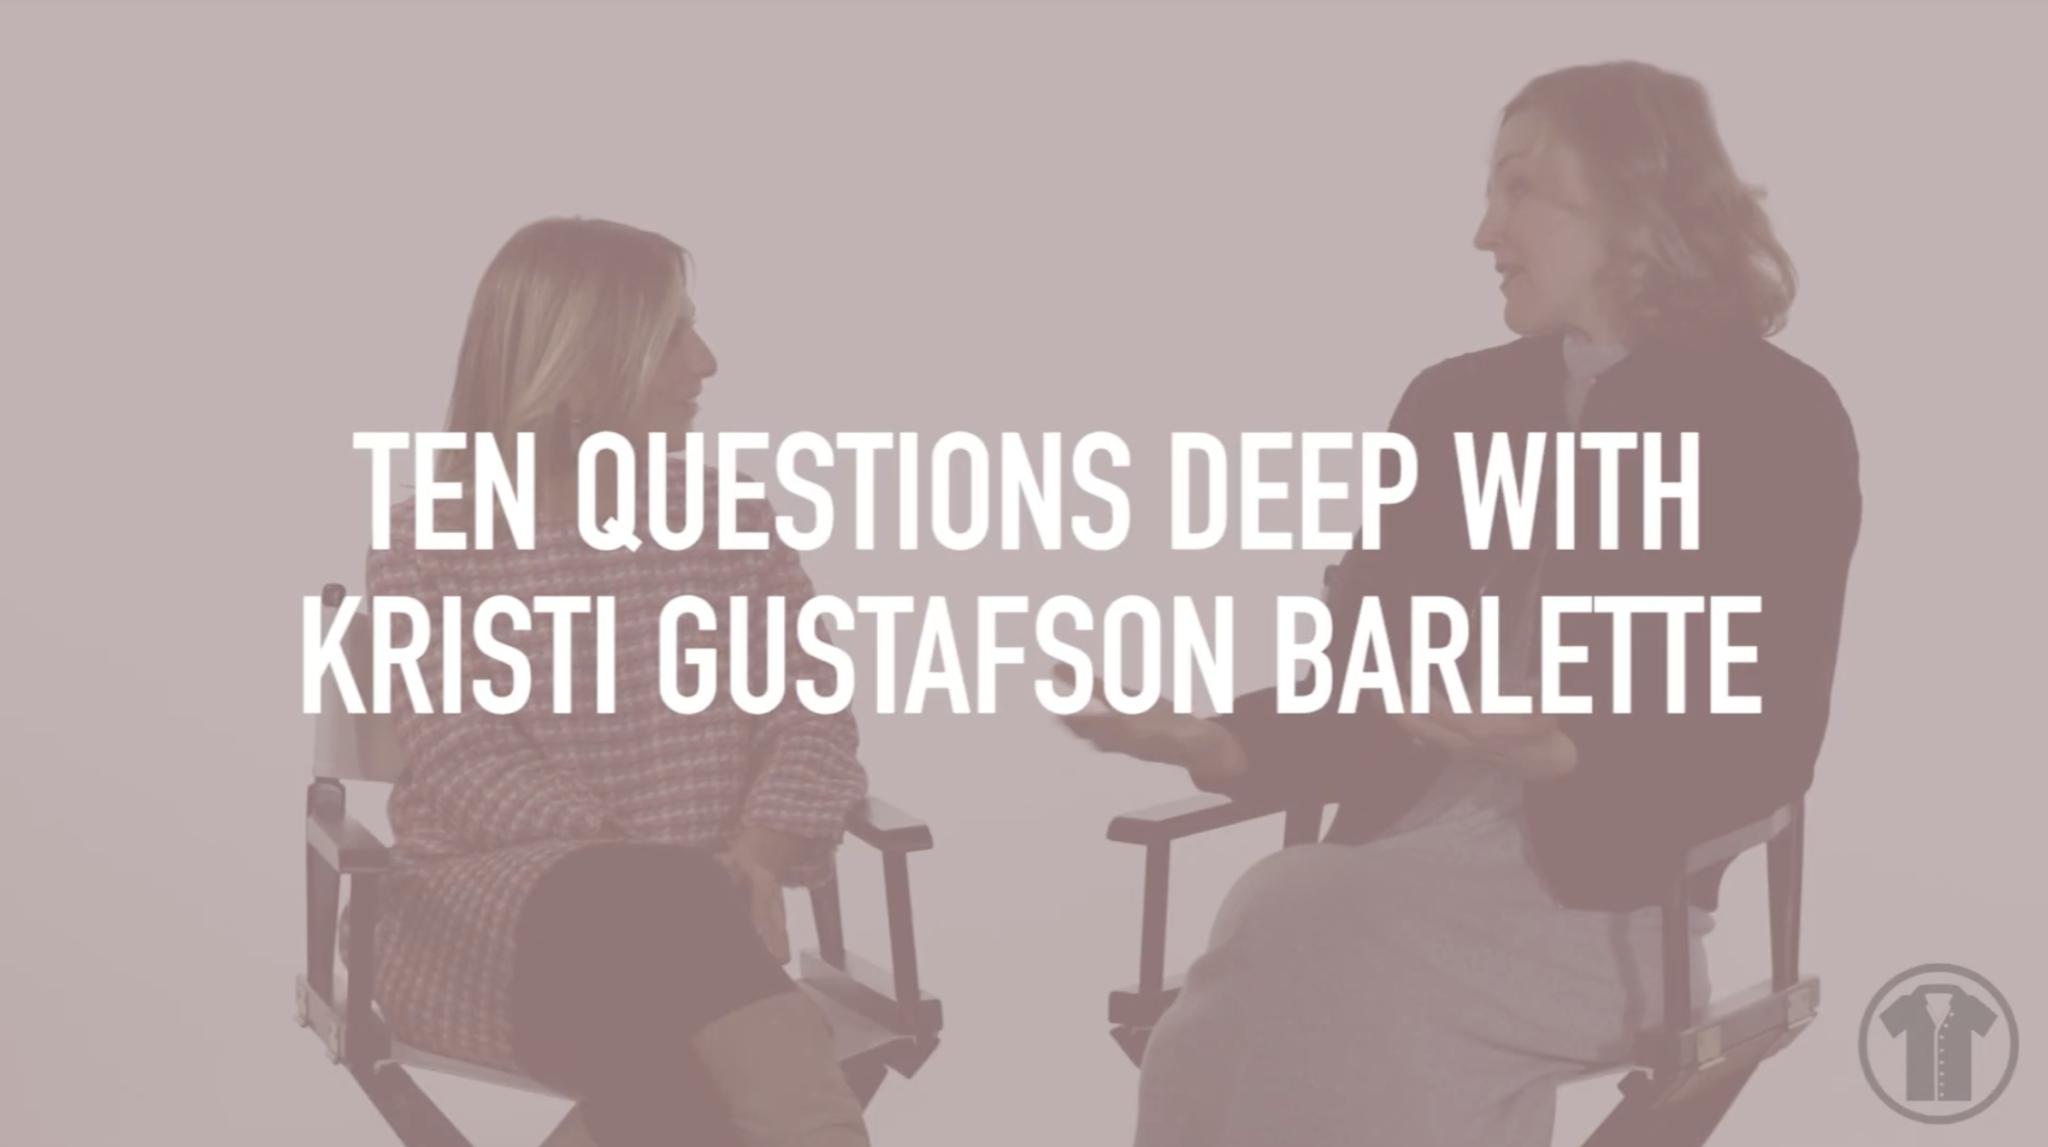 Ten Questions Deep with Kristi Gustafson Barlette